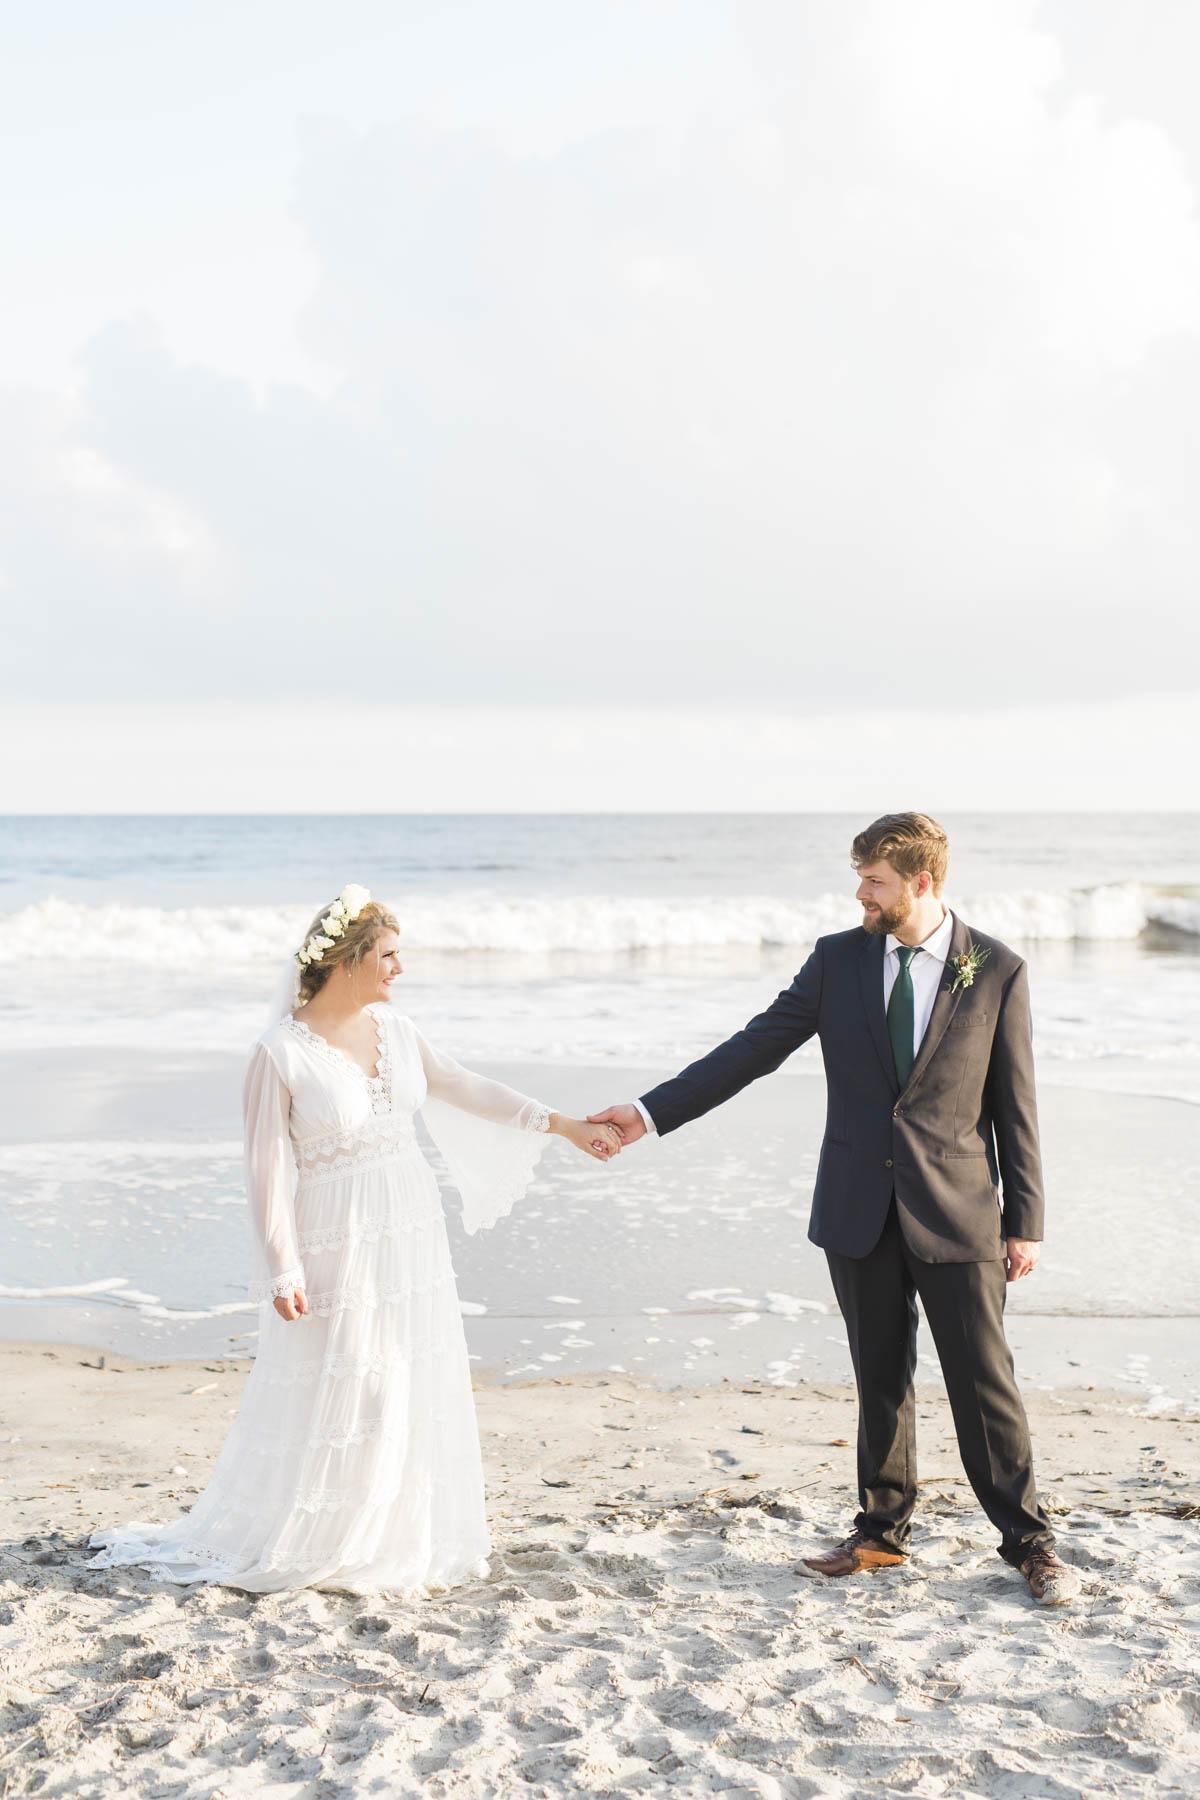 shotbychelsea_wedding_blog-45.jpg